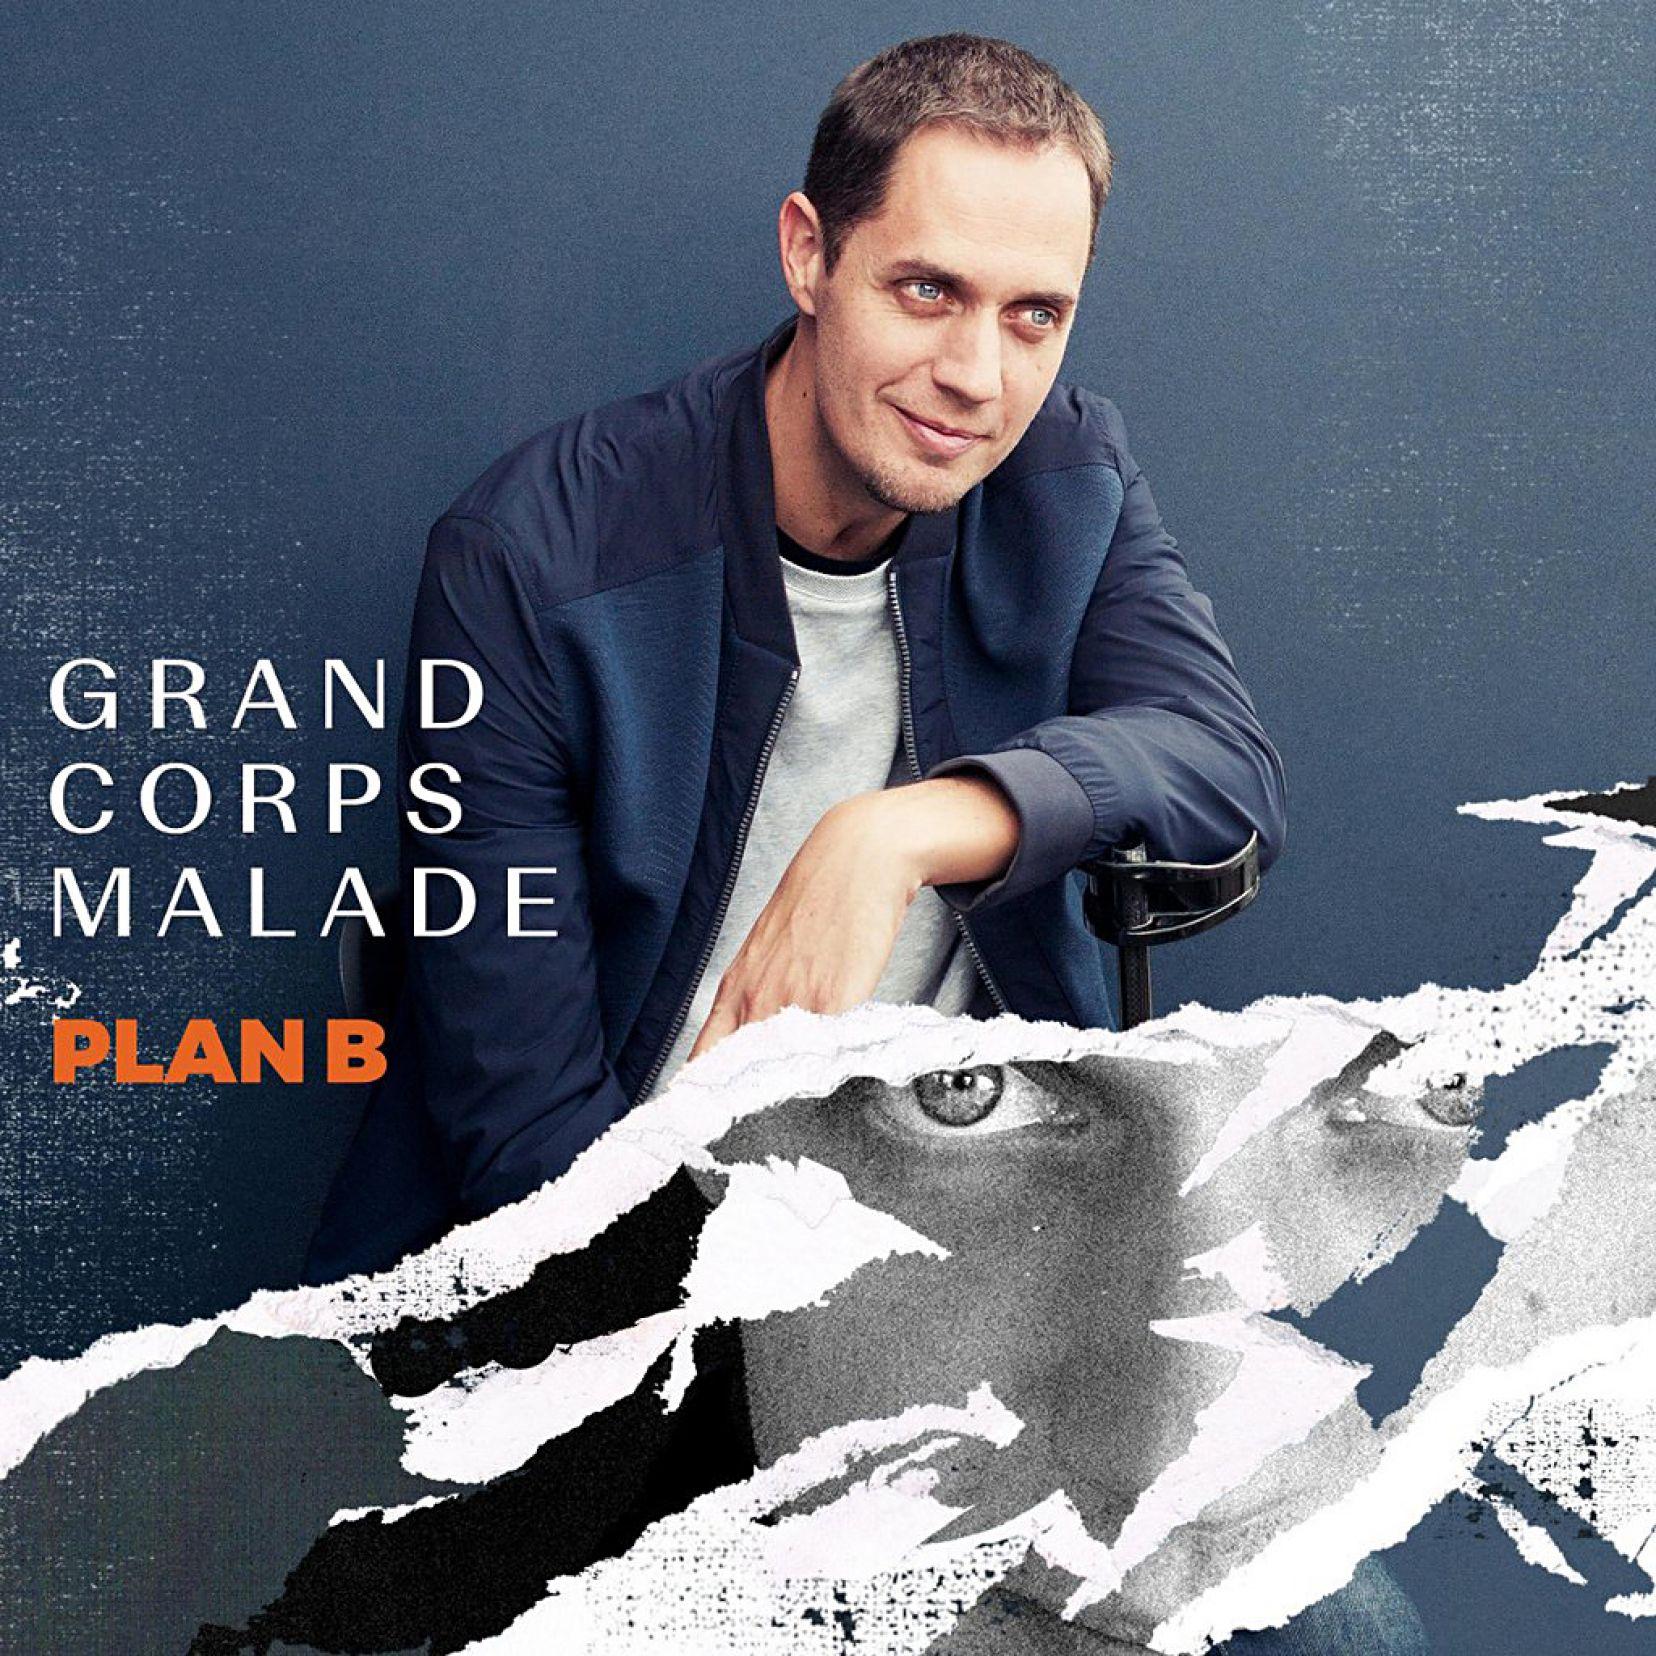 ☞ Grand Corps Malade